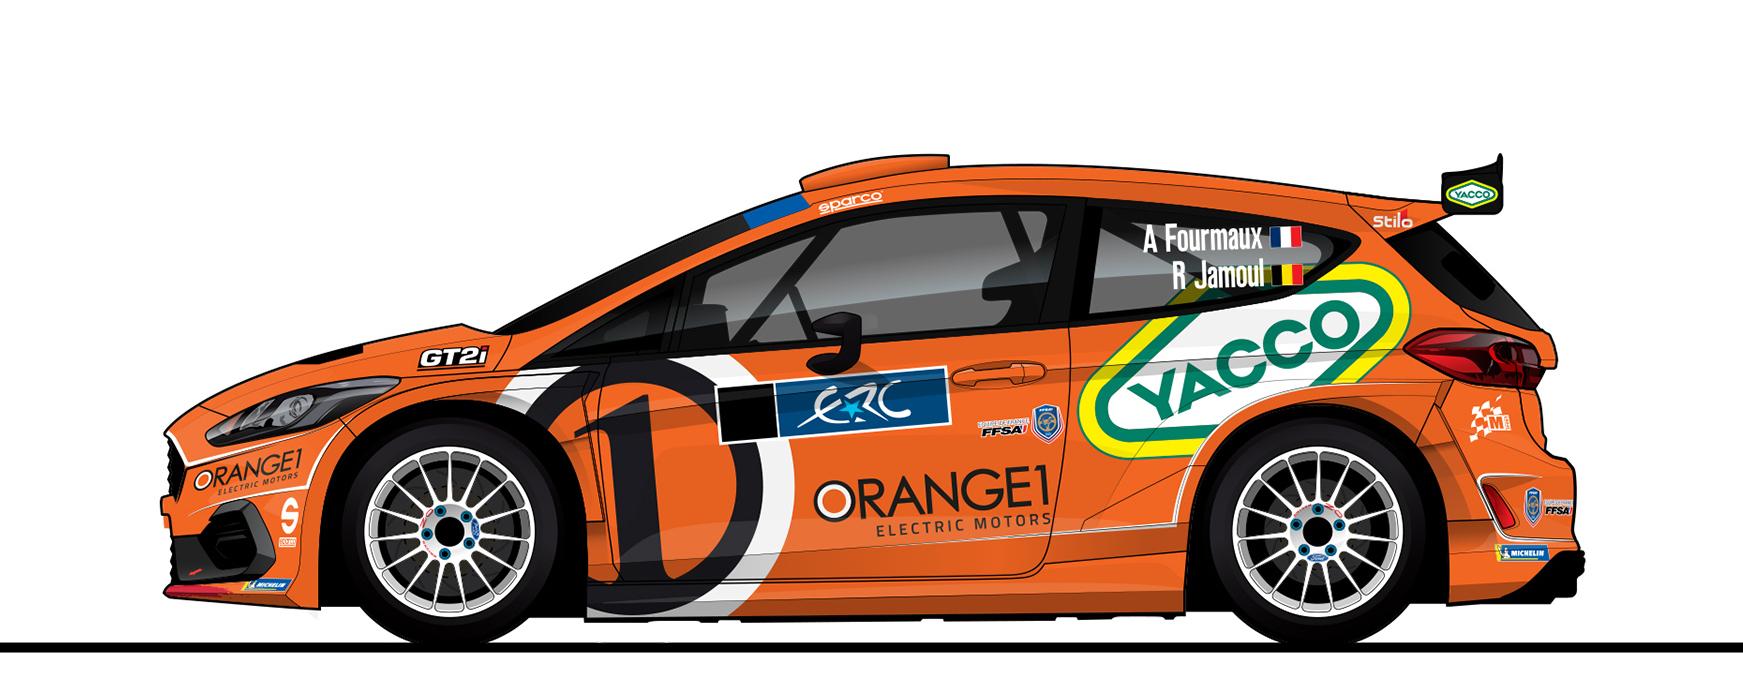 Fourmaux con Orange1 nell'ERC